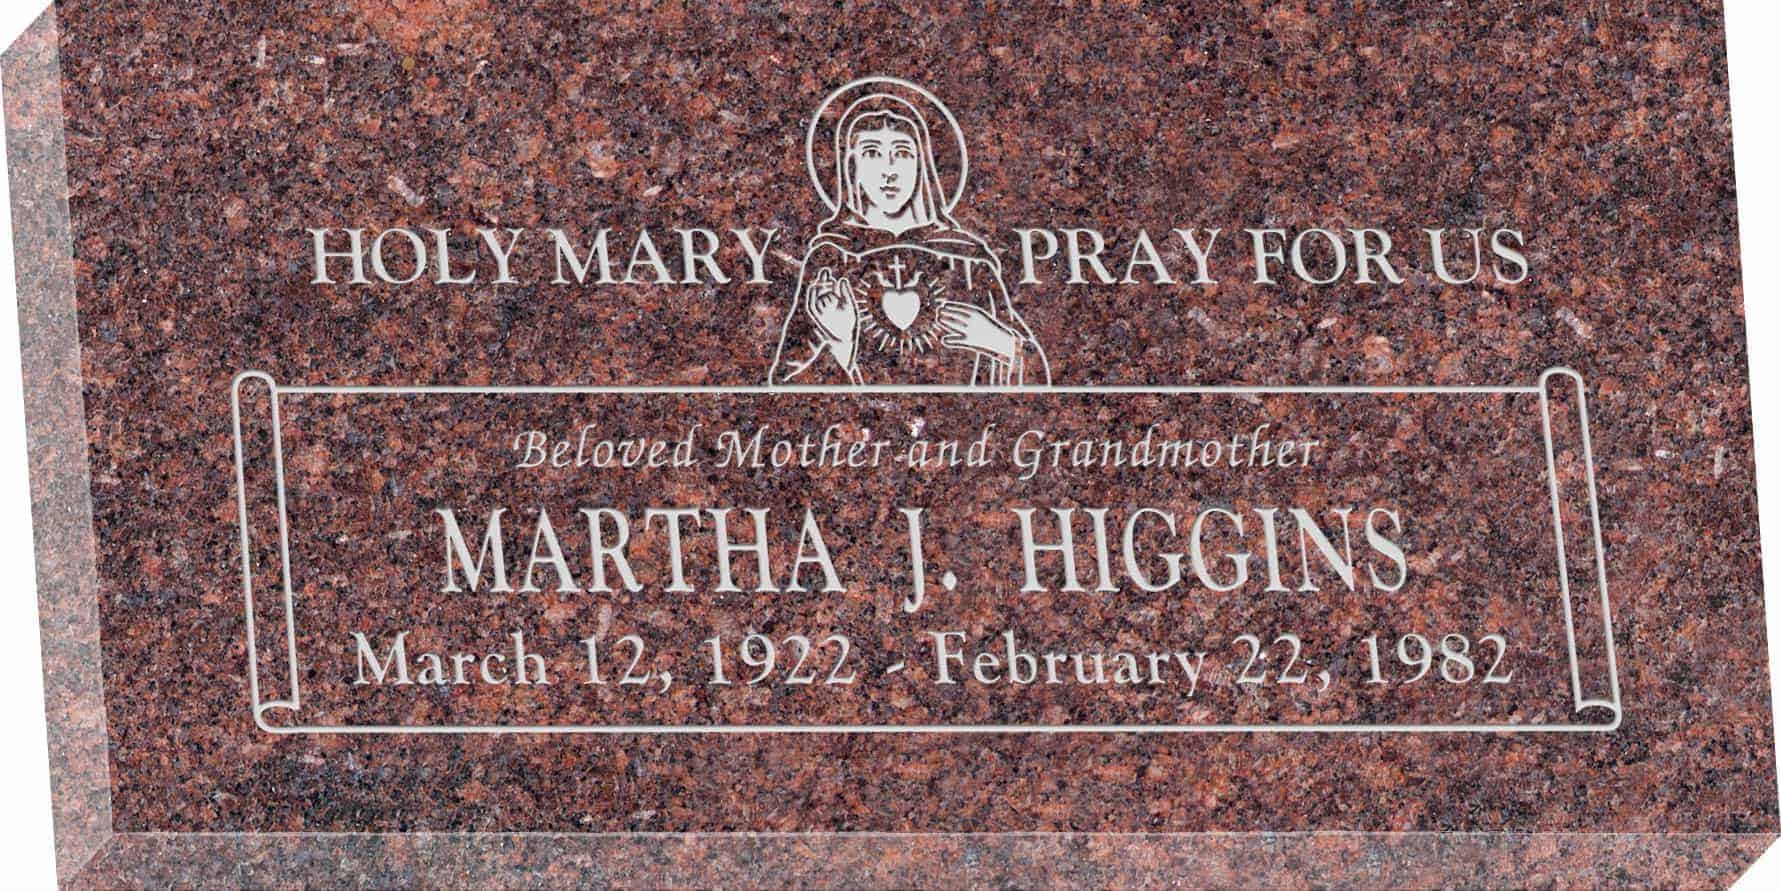 24inch_x_12inch_x_3inch_Flat_Granite_Headstone_in_Mahogany_with_design_R-51